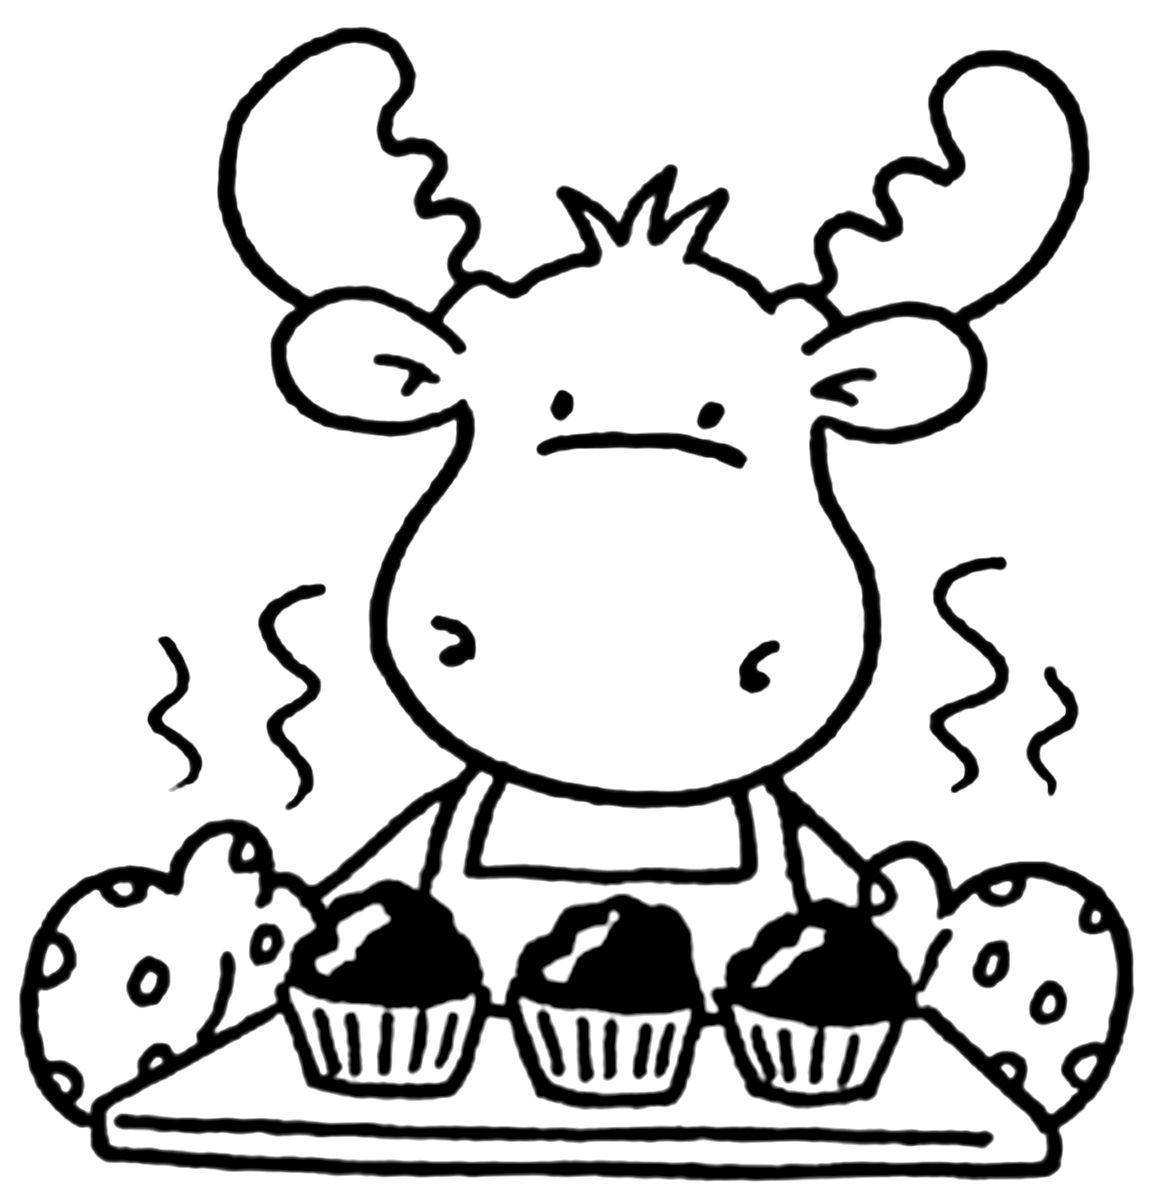 Http Riscosgraciosos Blogspot Com 2015 11 Riscos De Cervos E Renas Deer And Html Coloring Pages Quilted Potholder Pattern Digi Stamps